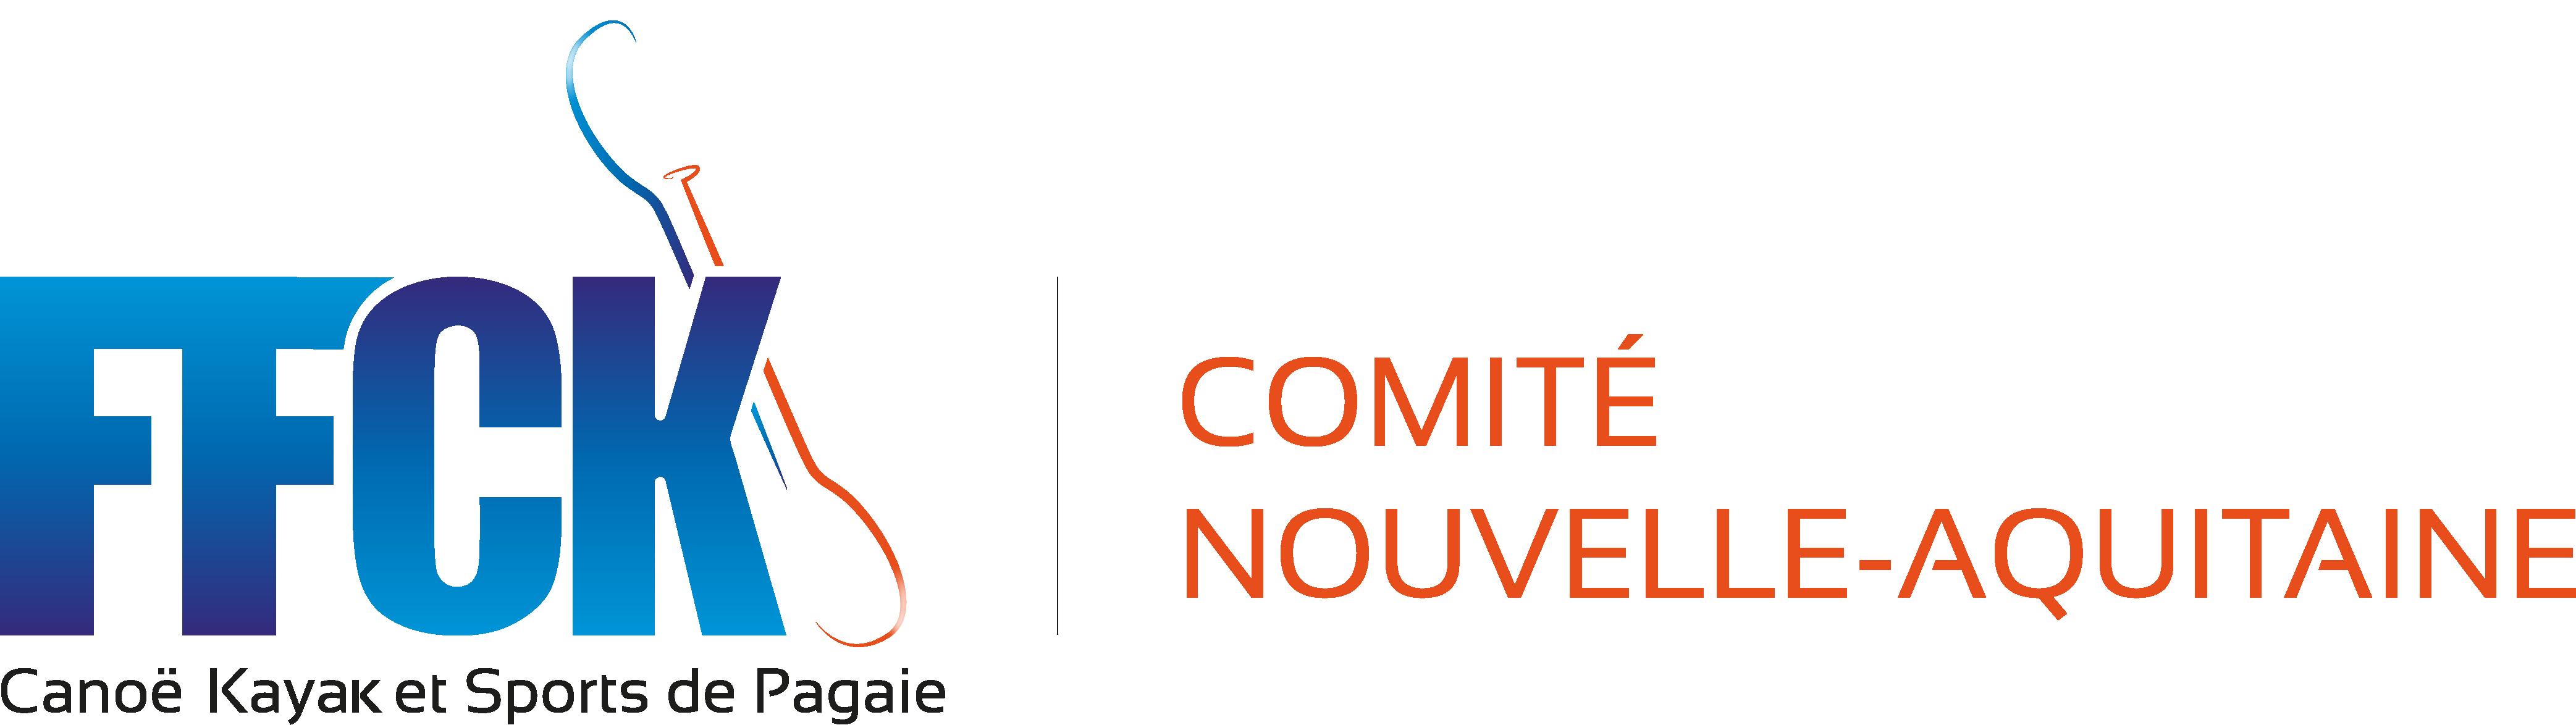 Comite Regional Canoe Kayak Nouvelle-Aquitaine